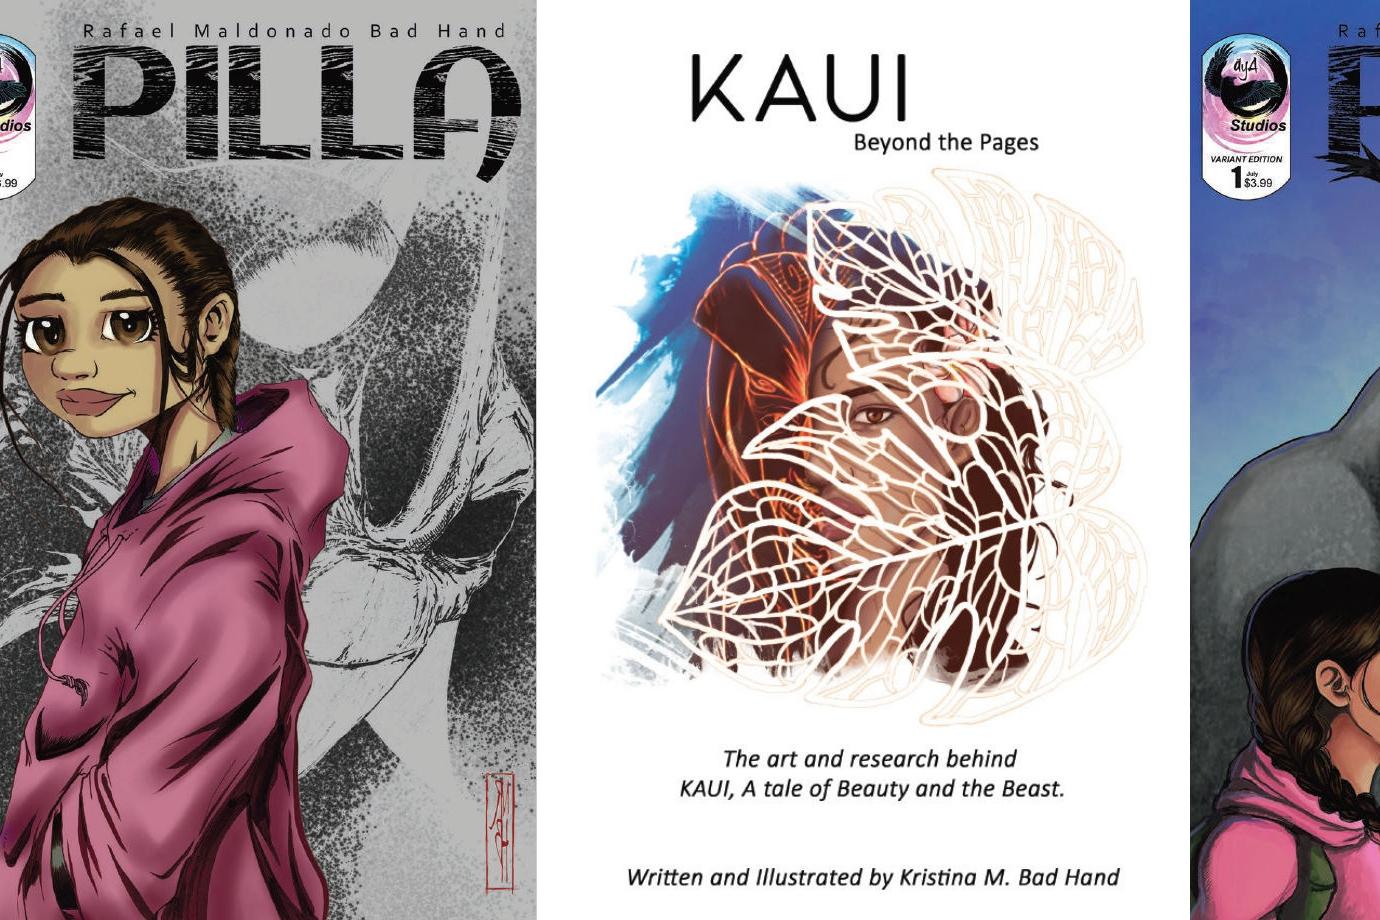 Pilla, Kaui, & áyA Studios - An Interview With Rafael & Kristina Maldonado-Bad Hand (DINK 2018)   Written by Neil Greenaway